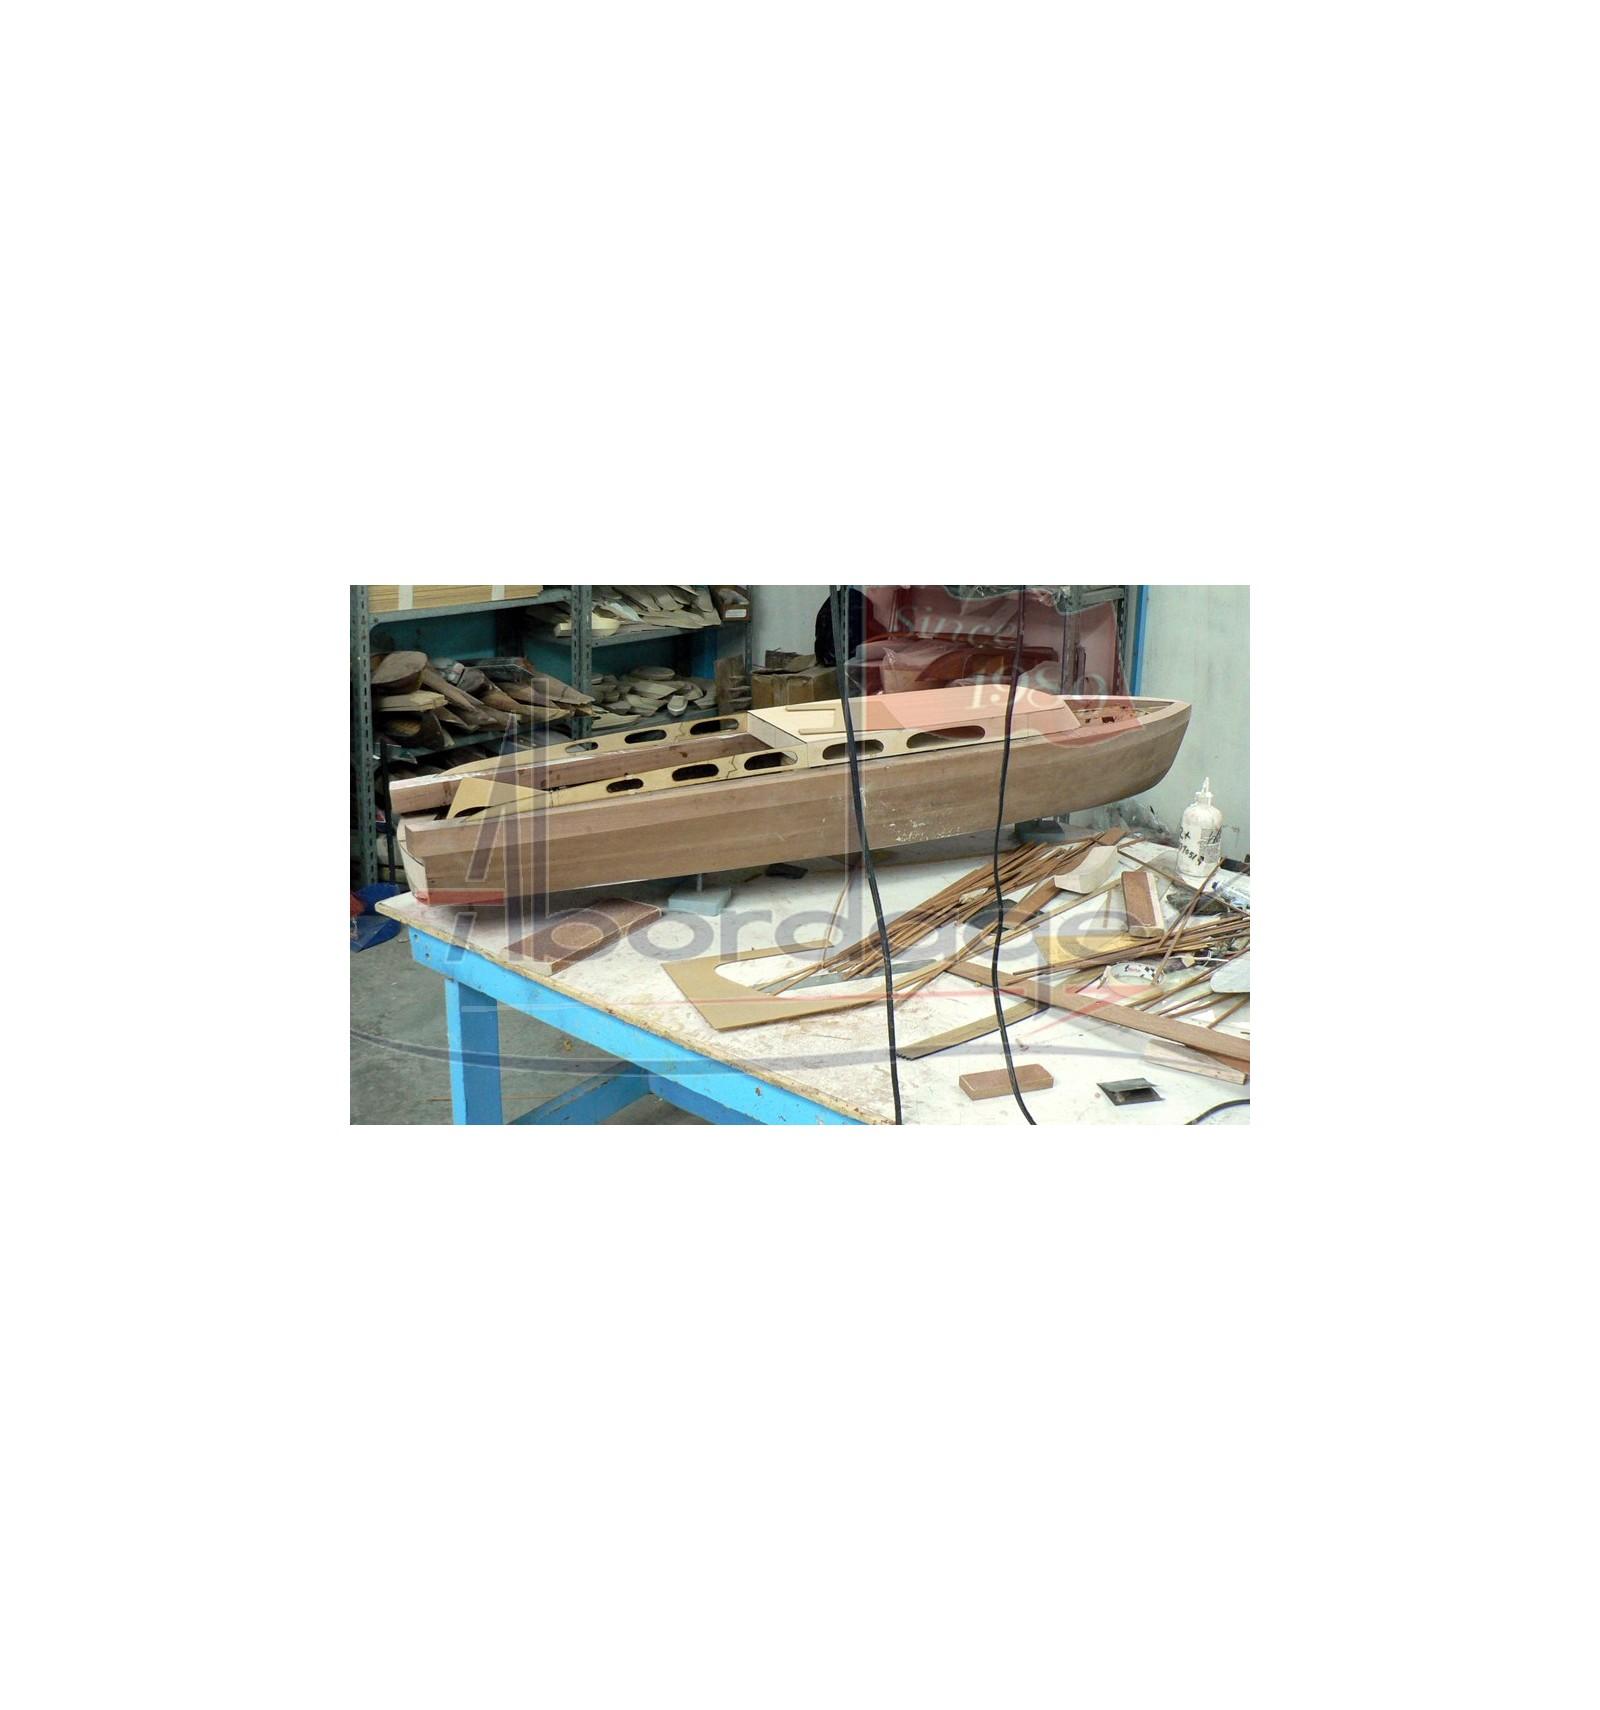 "hacker-craft ""thunderbird"" 1939 - 55 foot wooden speedboat."